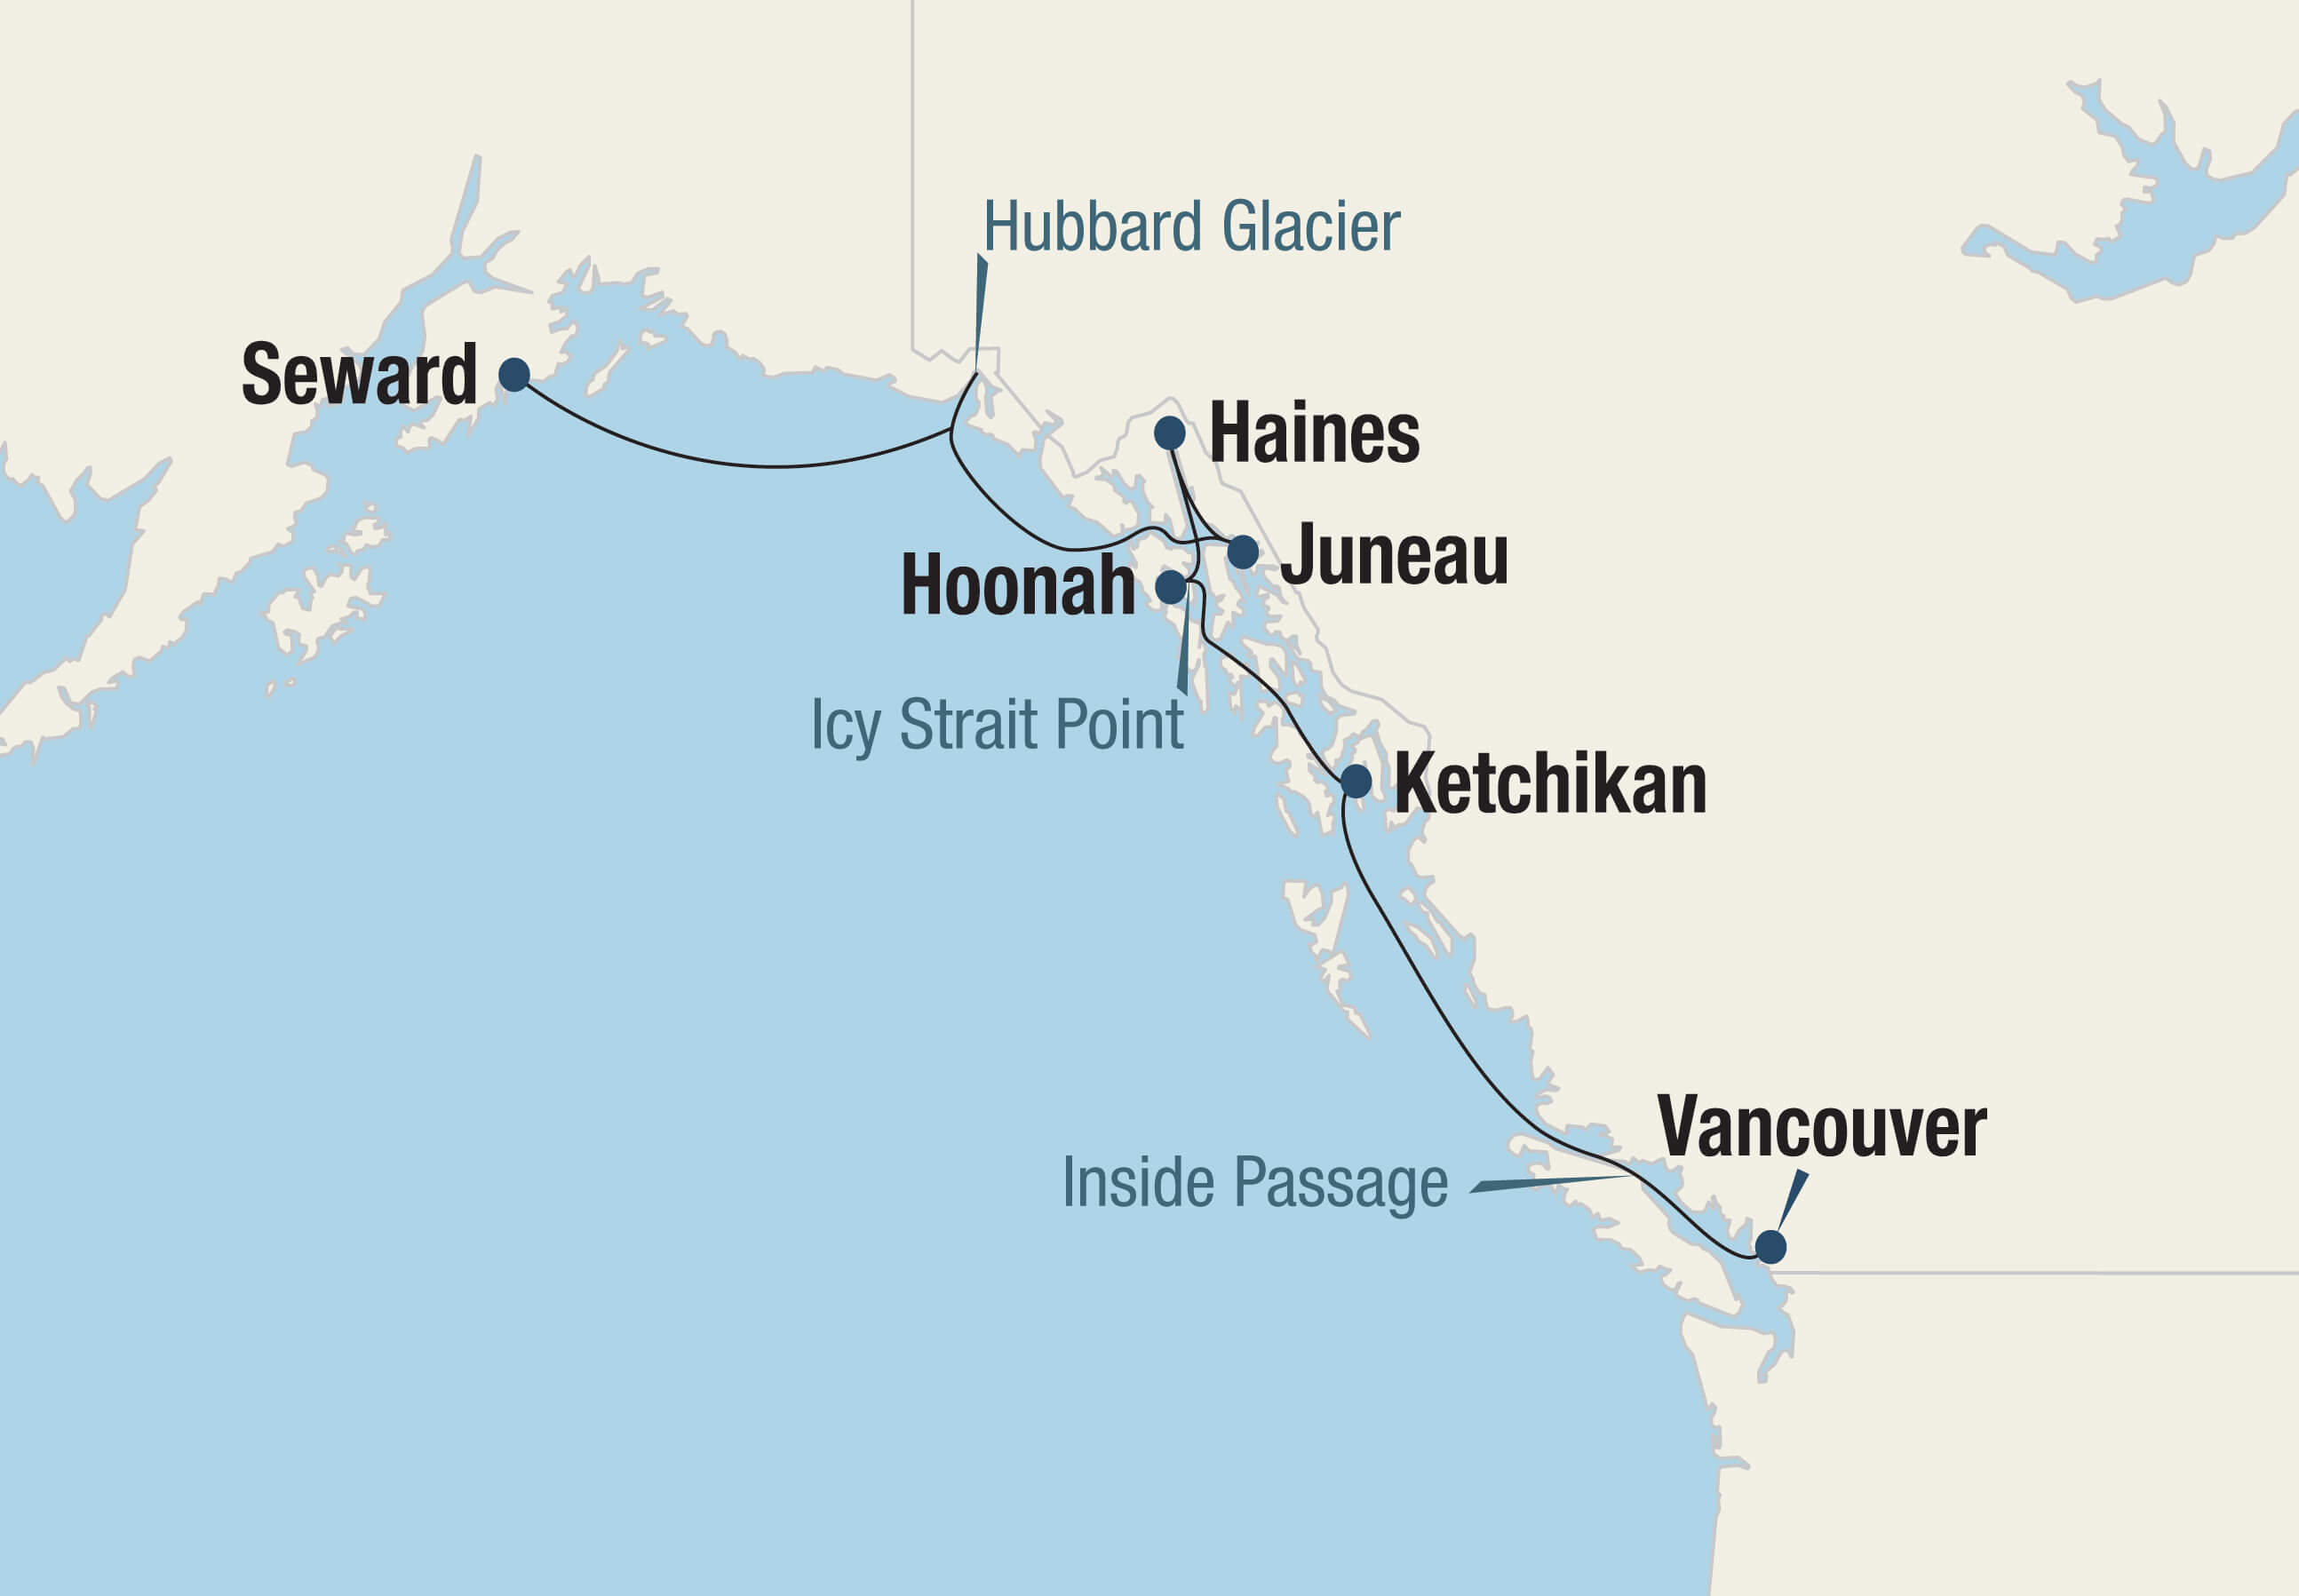 Icy Strait Point Alaska Map.Summer Vistas Of Alaska 7 23 2020 7 30 2020 Go Next